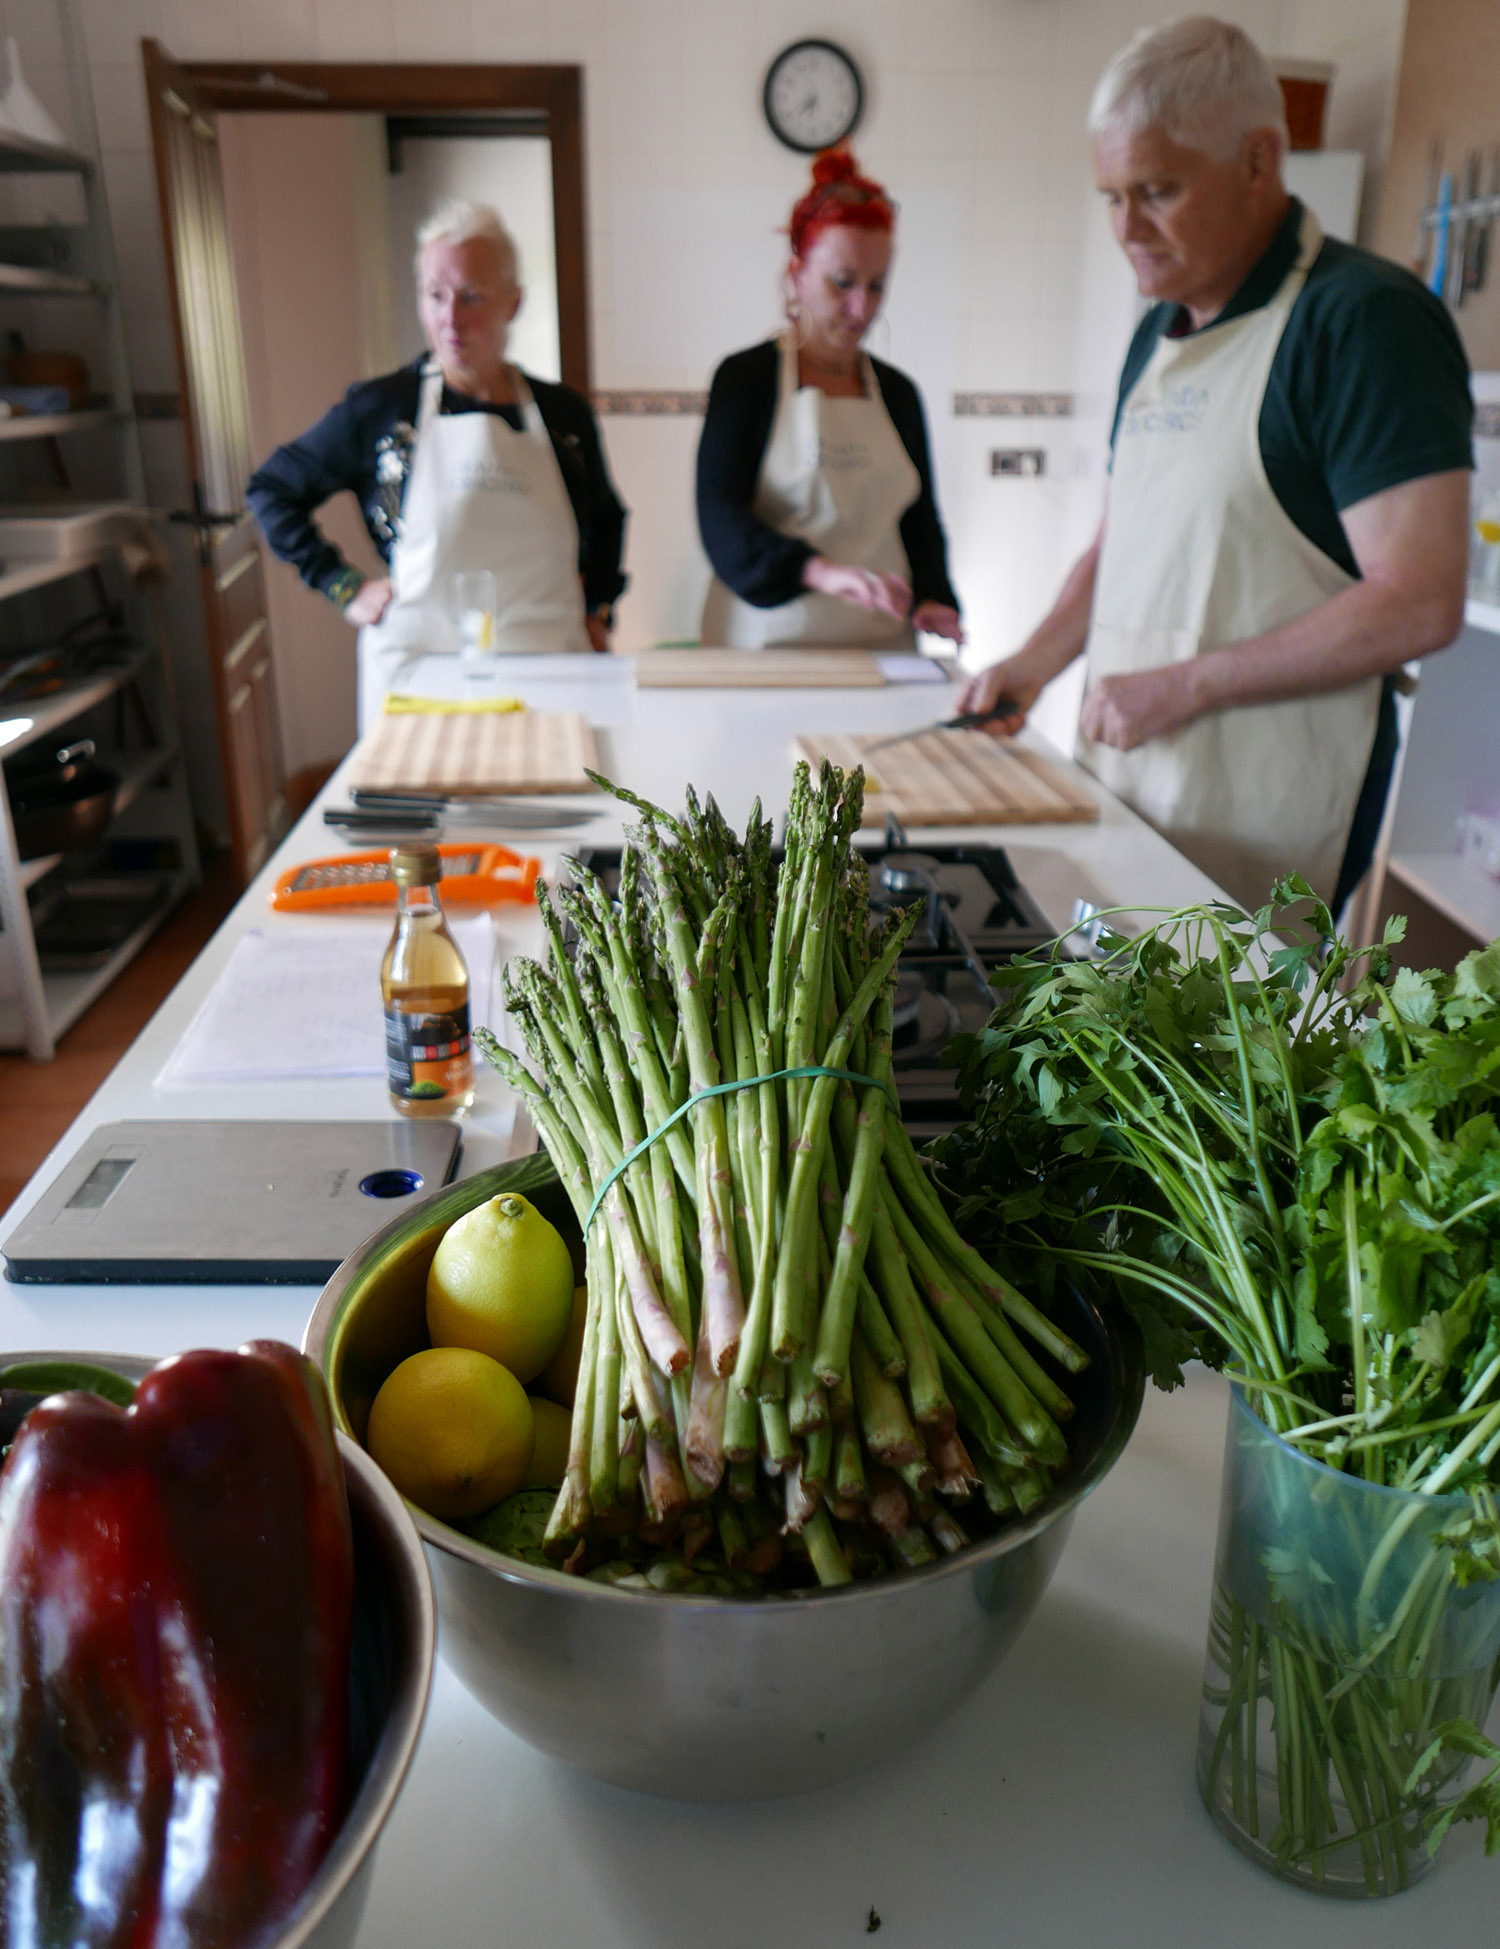 GC_Cookery_kitchen asparagus.jpg